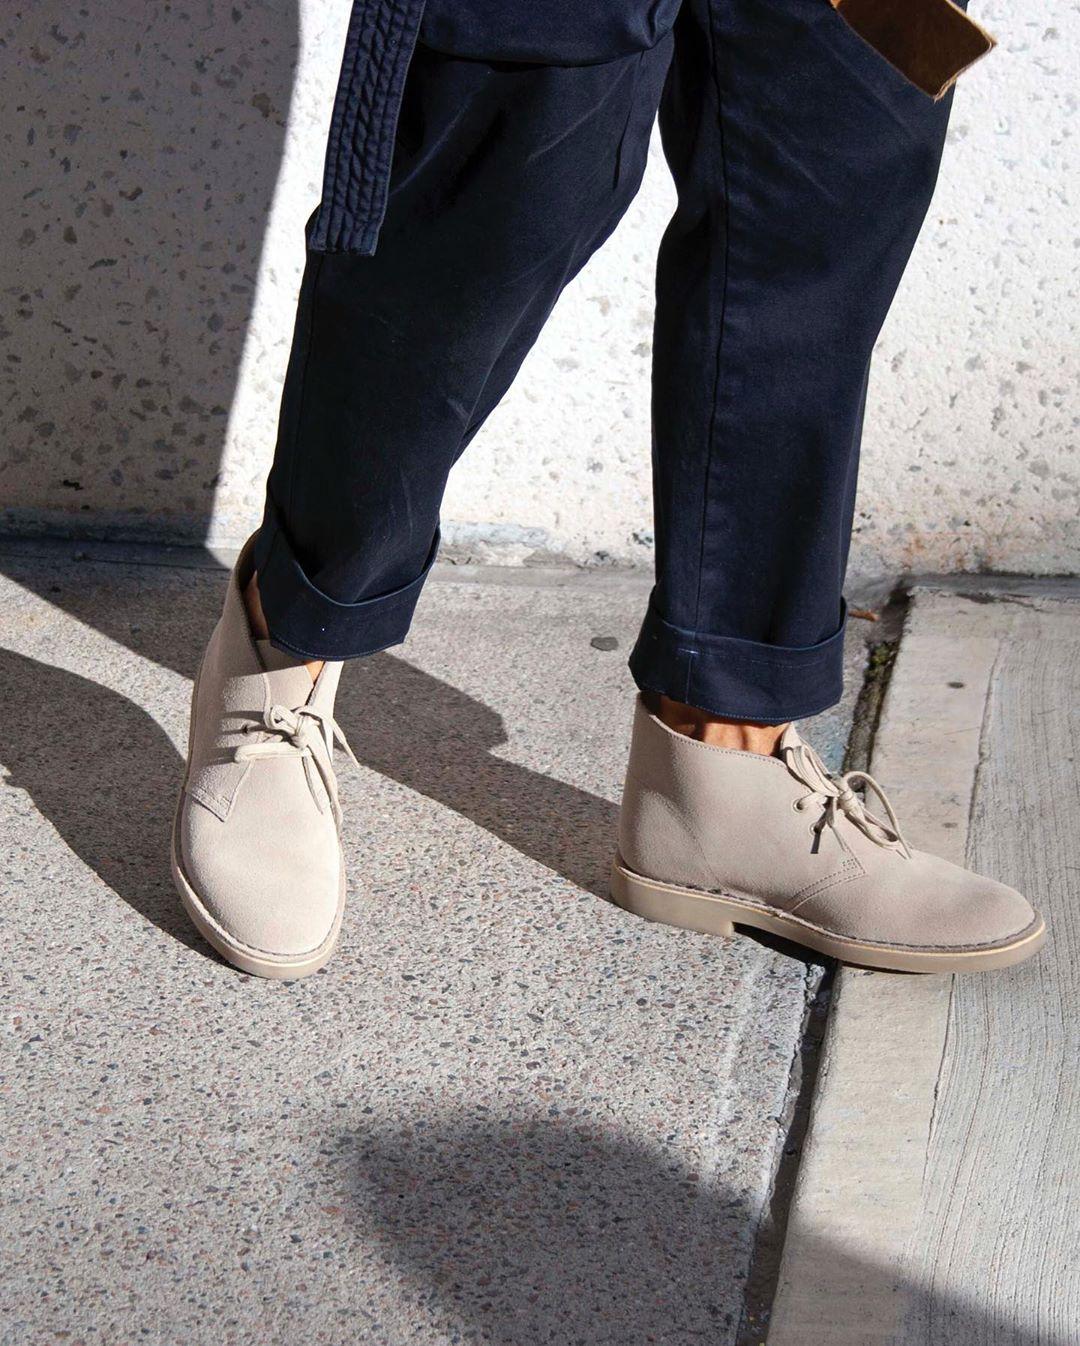 giày chukka boots màu xám